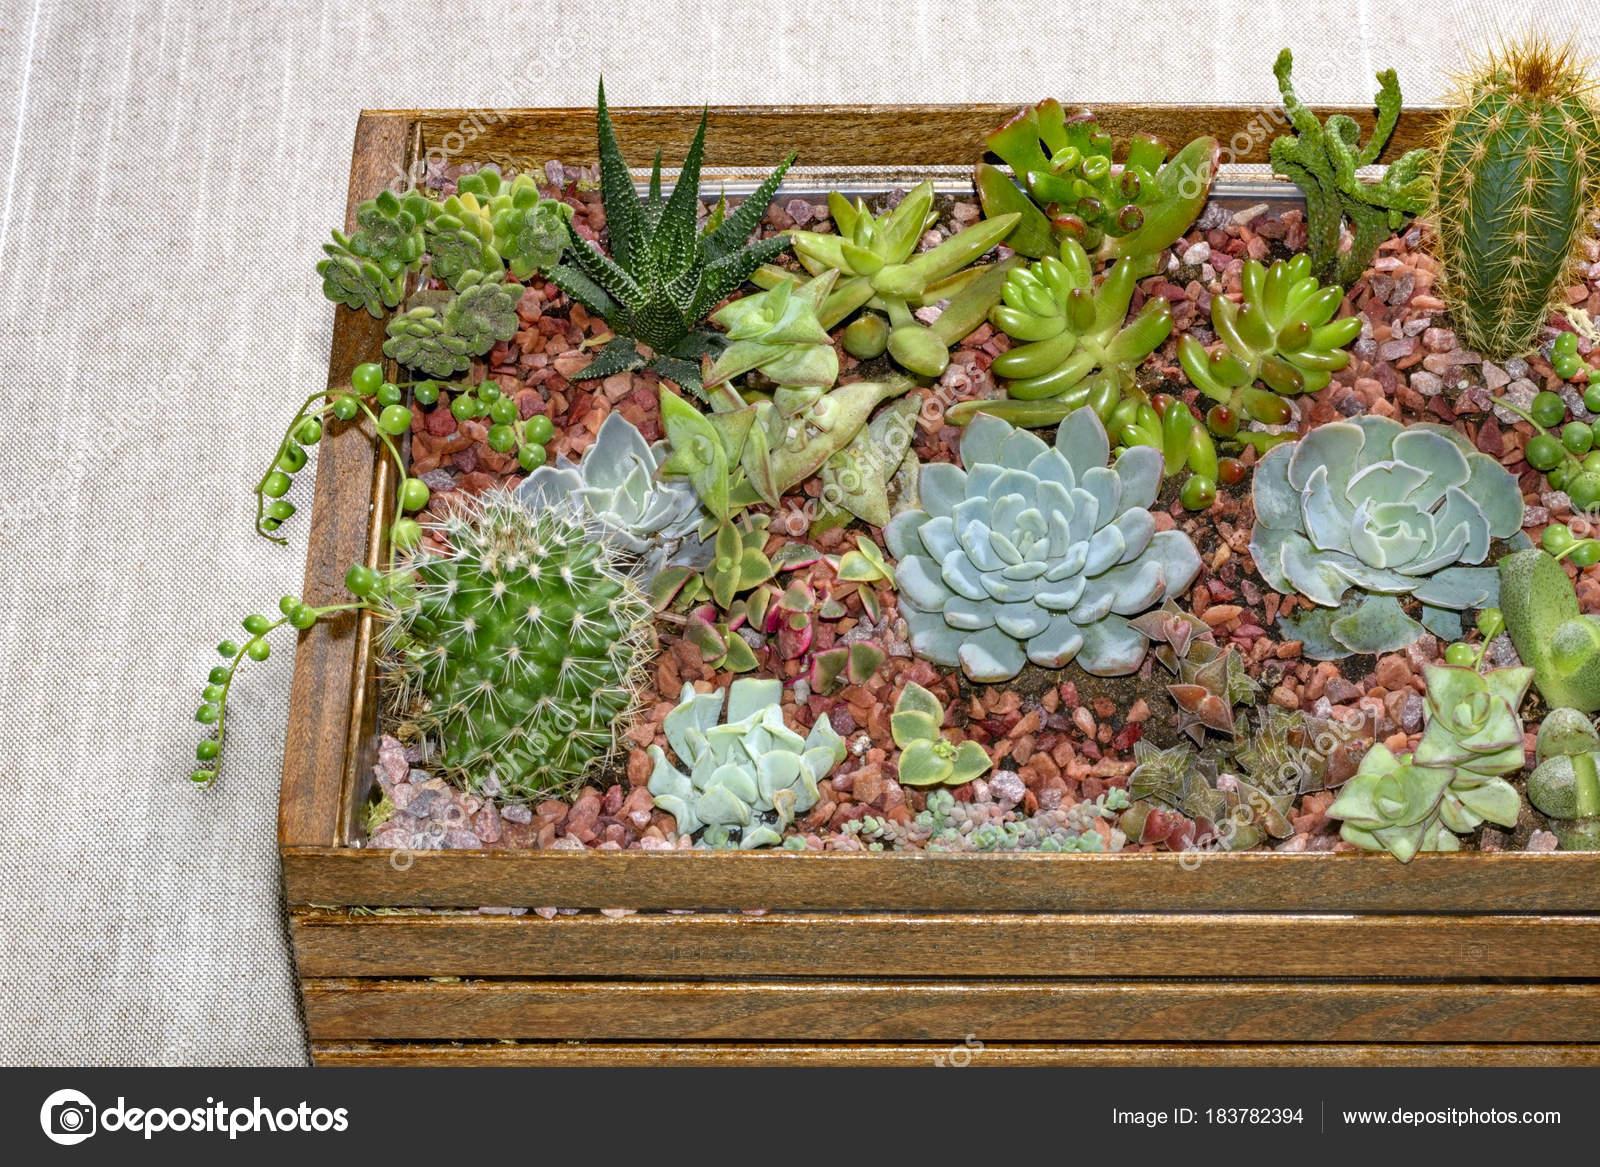 Home Mini Succulent Cactus Garden Arranged Dark Wooden Box ... concernant Jardin Cactus Miniature